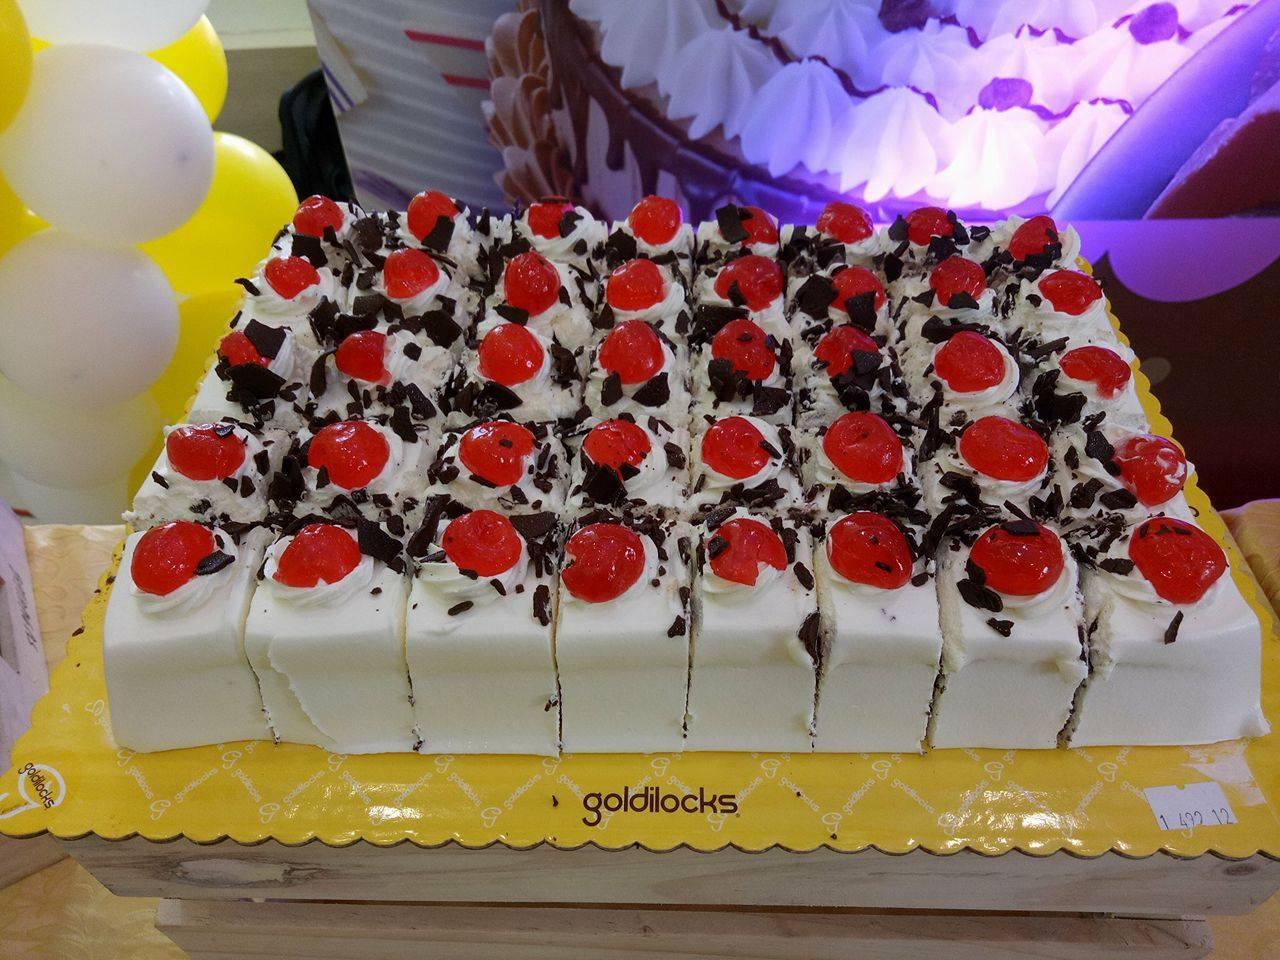 Goldilocks Celebrates National Cake Day